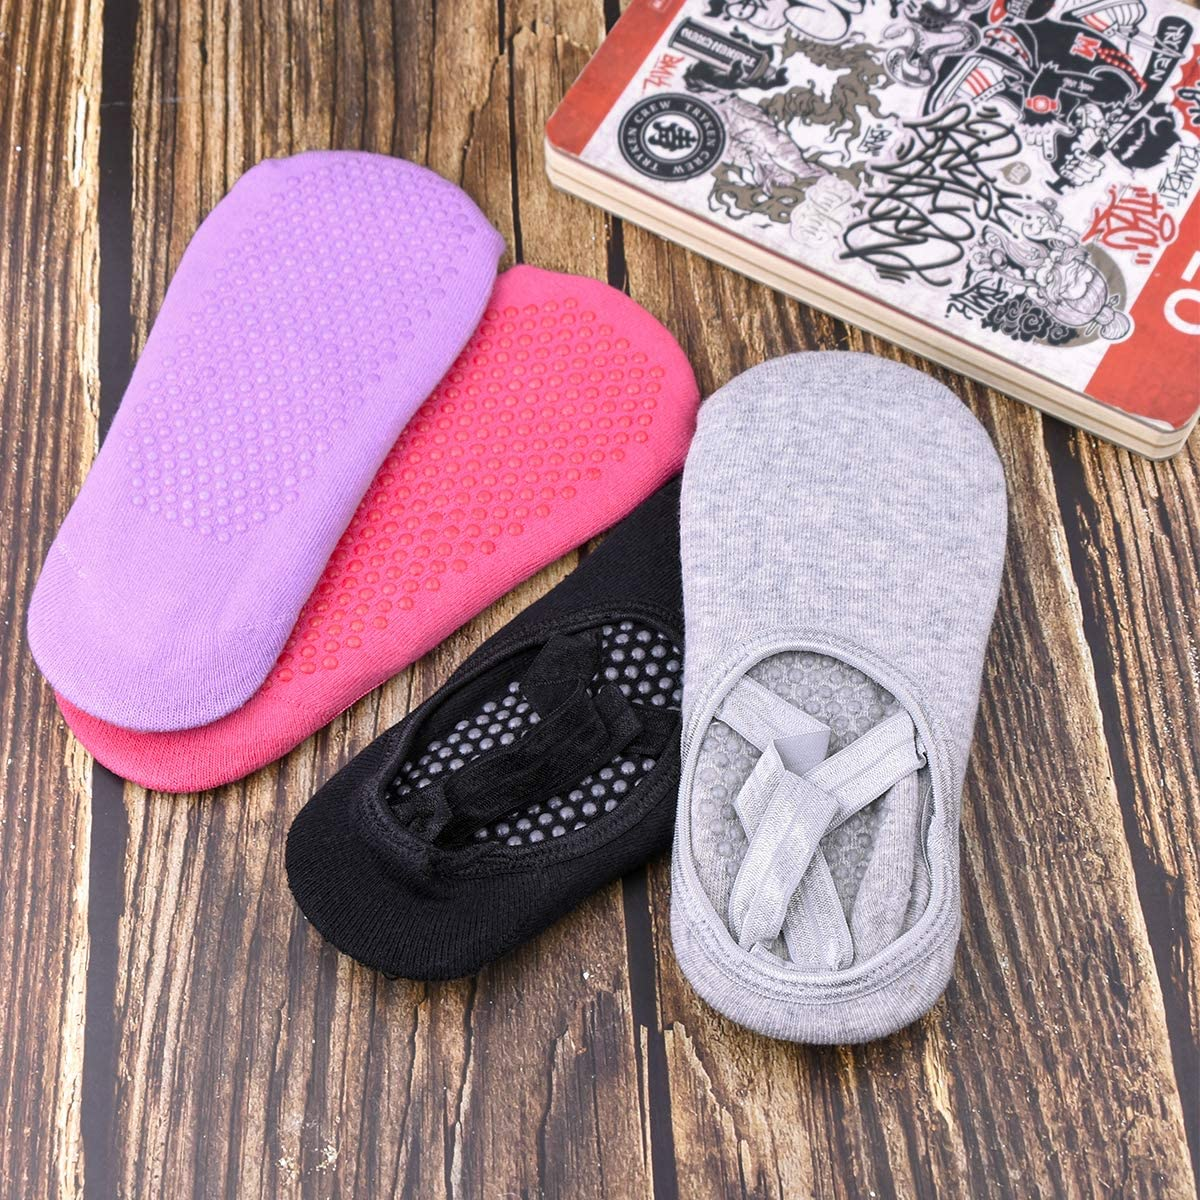 Podinor Yoga Socks for Women Non Slip Anti Skid Sticky Grippers Socks with Grips for Yoga Pilates Barre